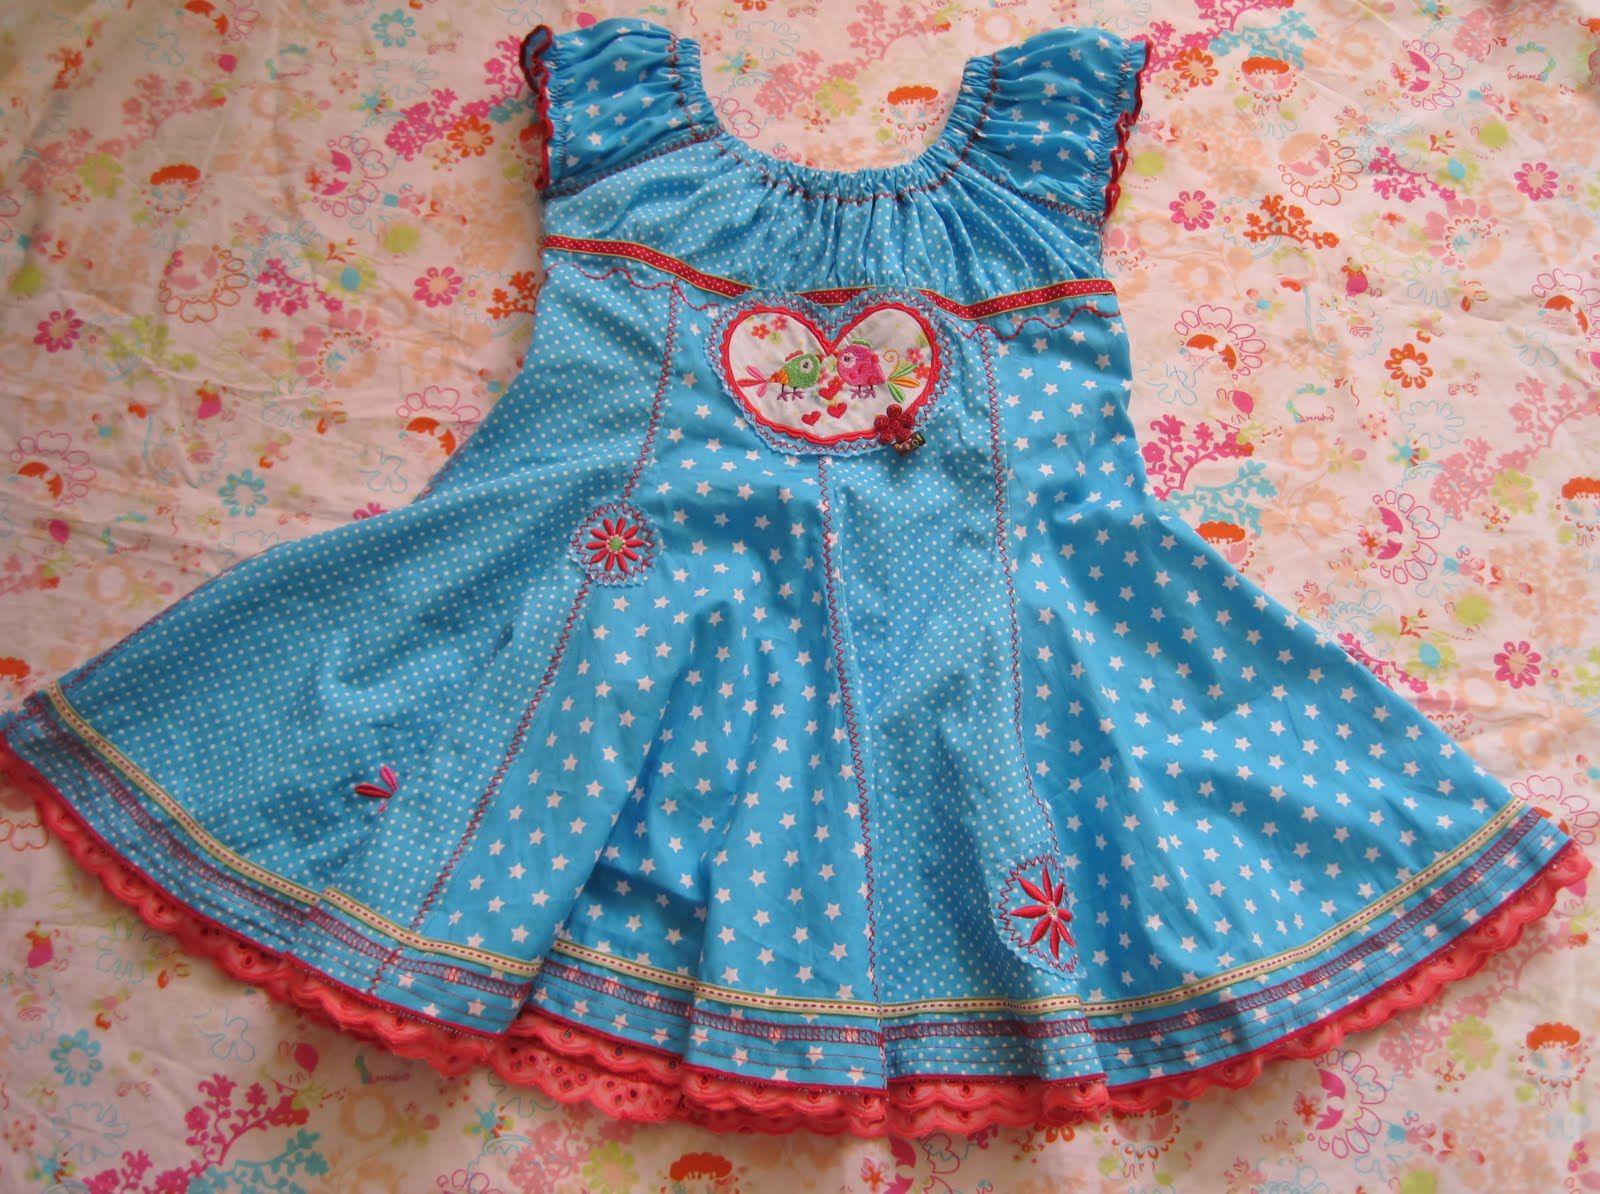 made by Mama   Kinderkleidung, Kinder kleider, Farbenmix